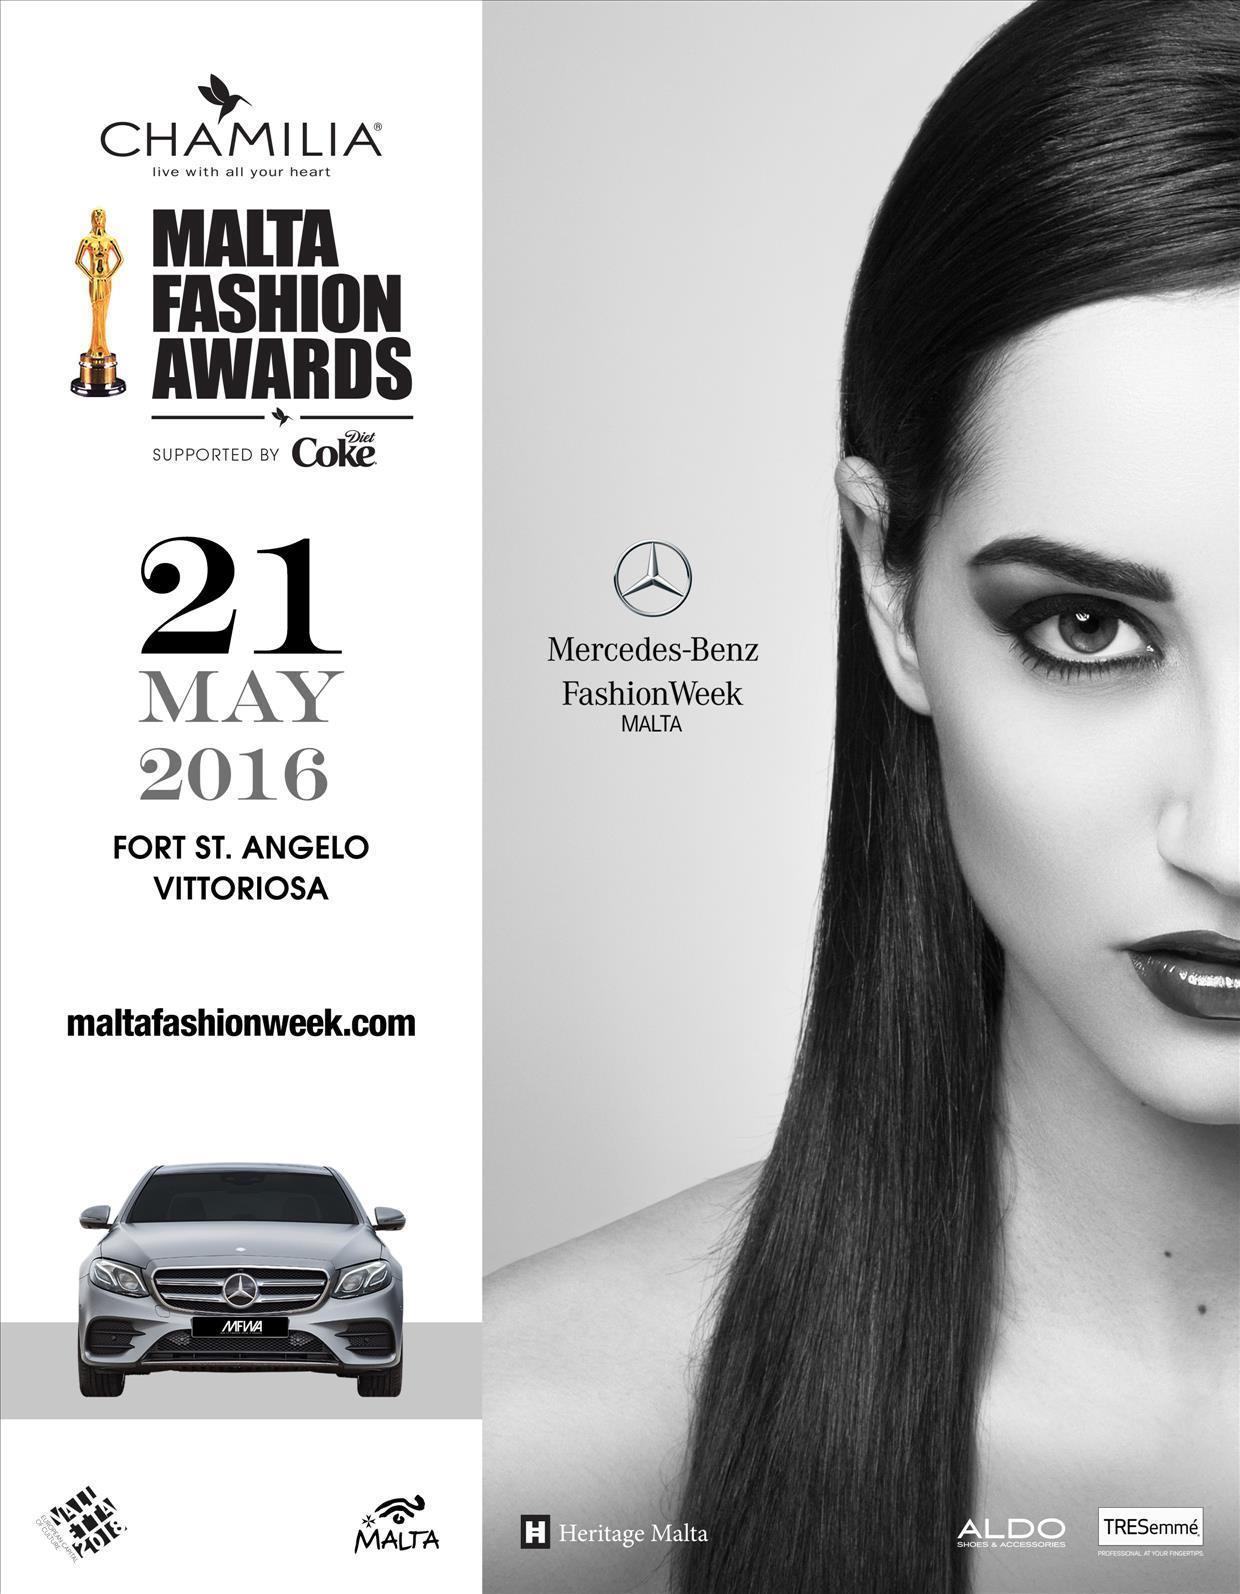 The Chamilia Malta Fashion Awards 2016 flyer